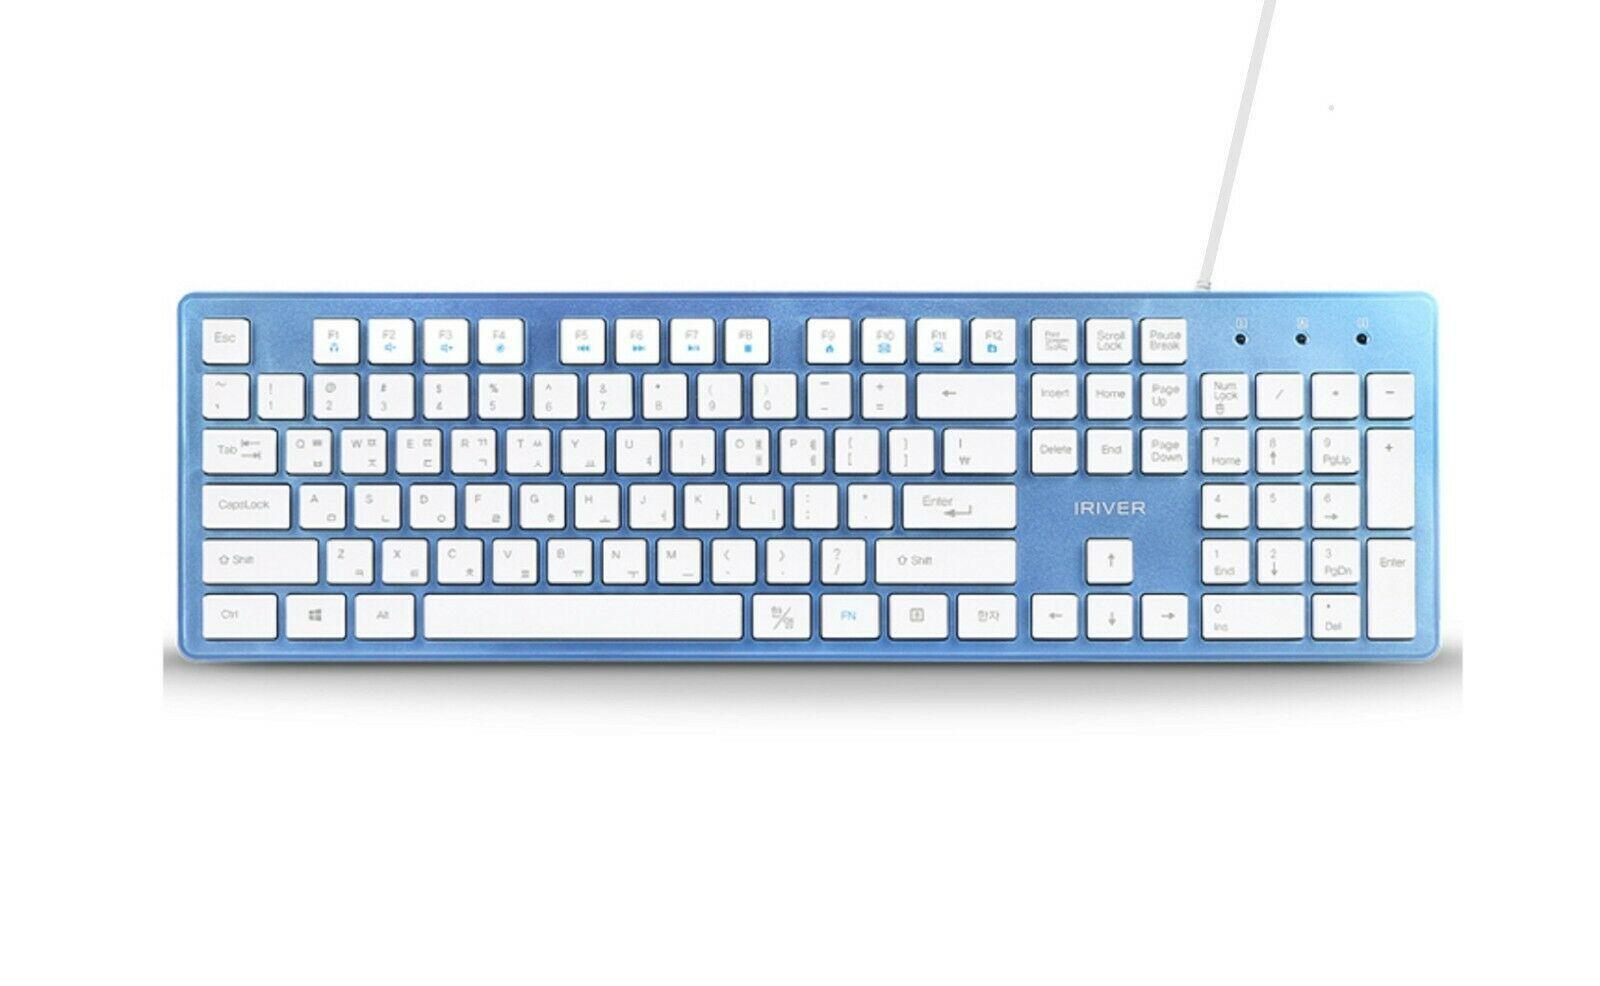 iRiver Korean English Keyboard USB Wired Membrane Cover Skin Protector (Blue)